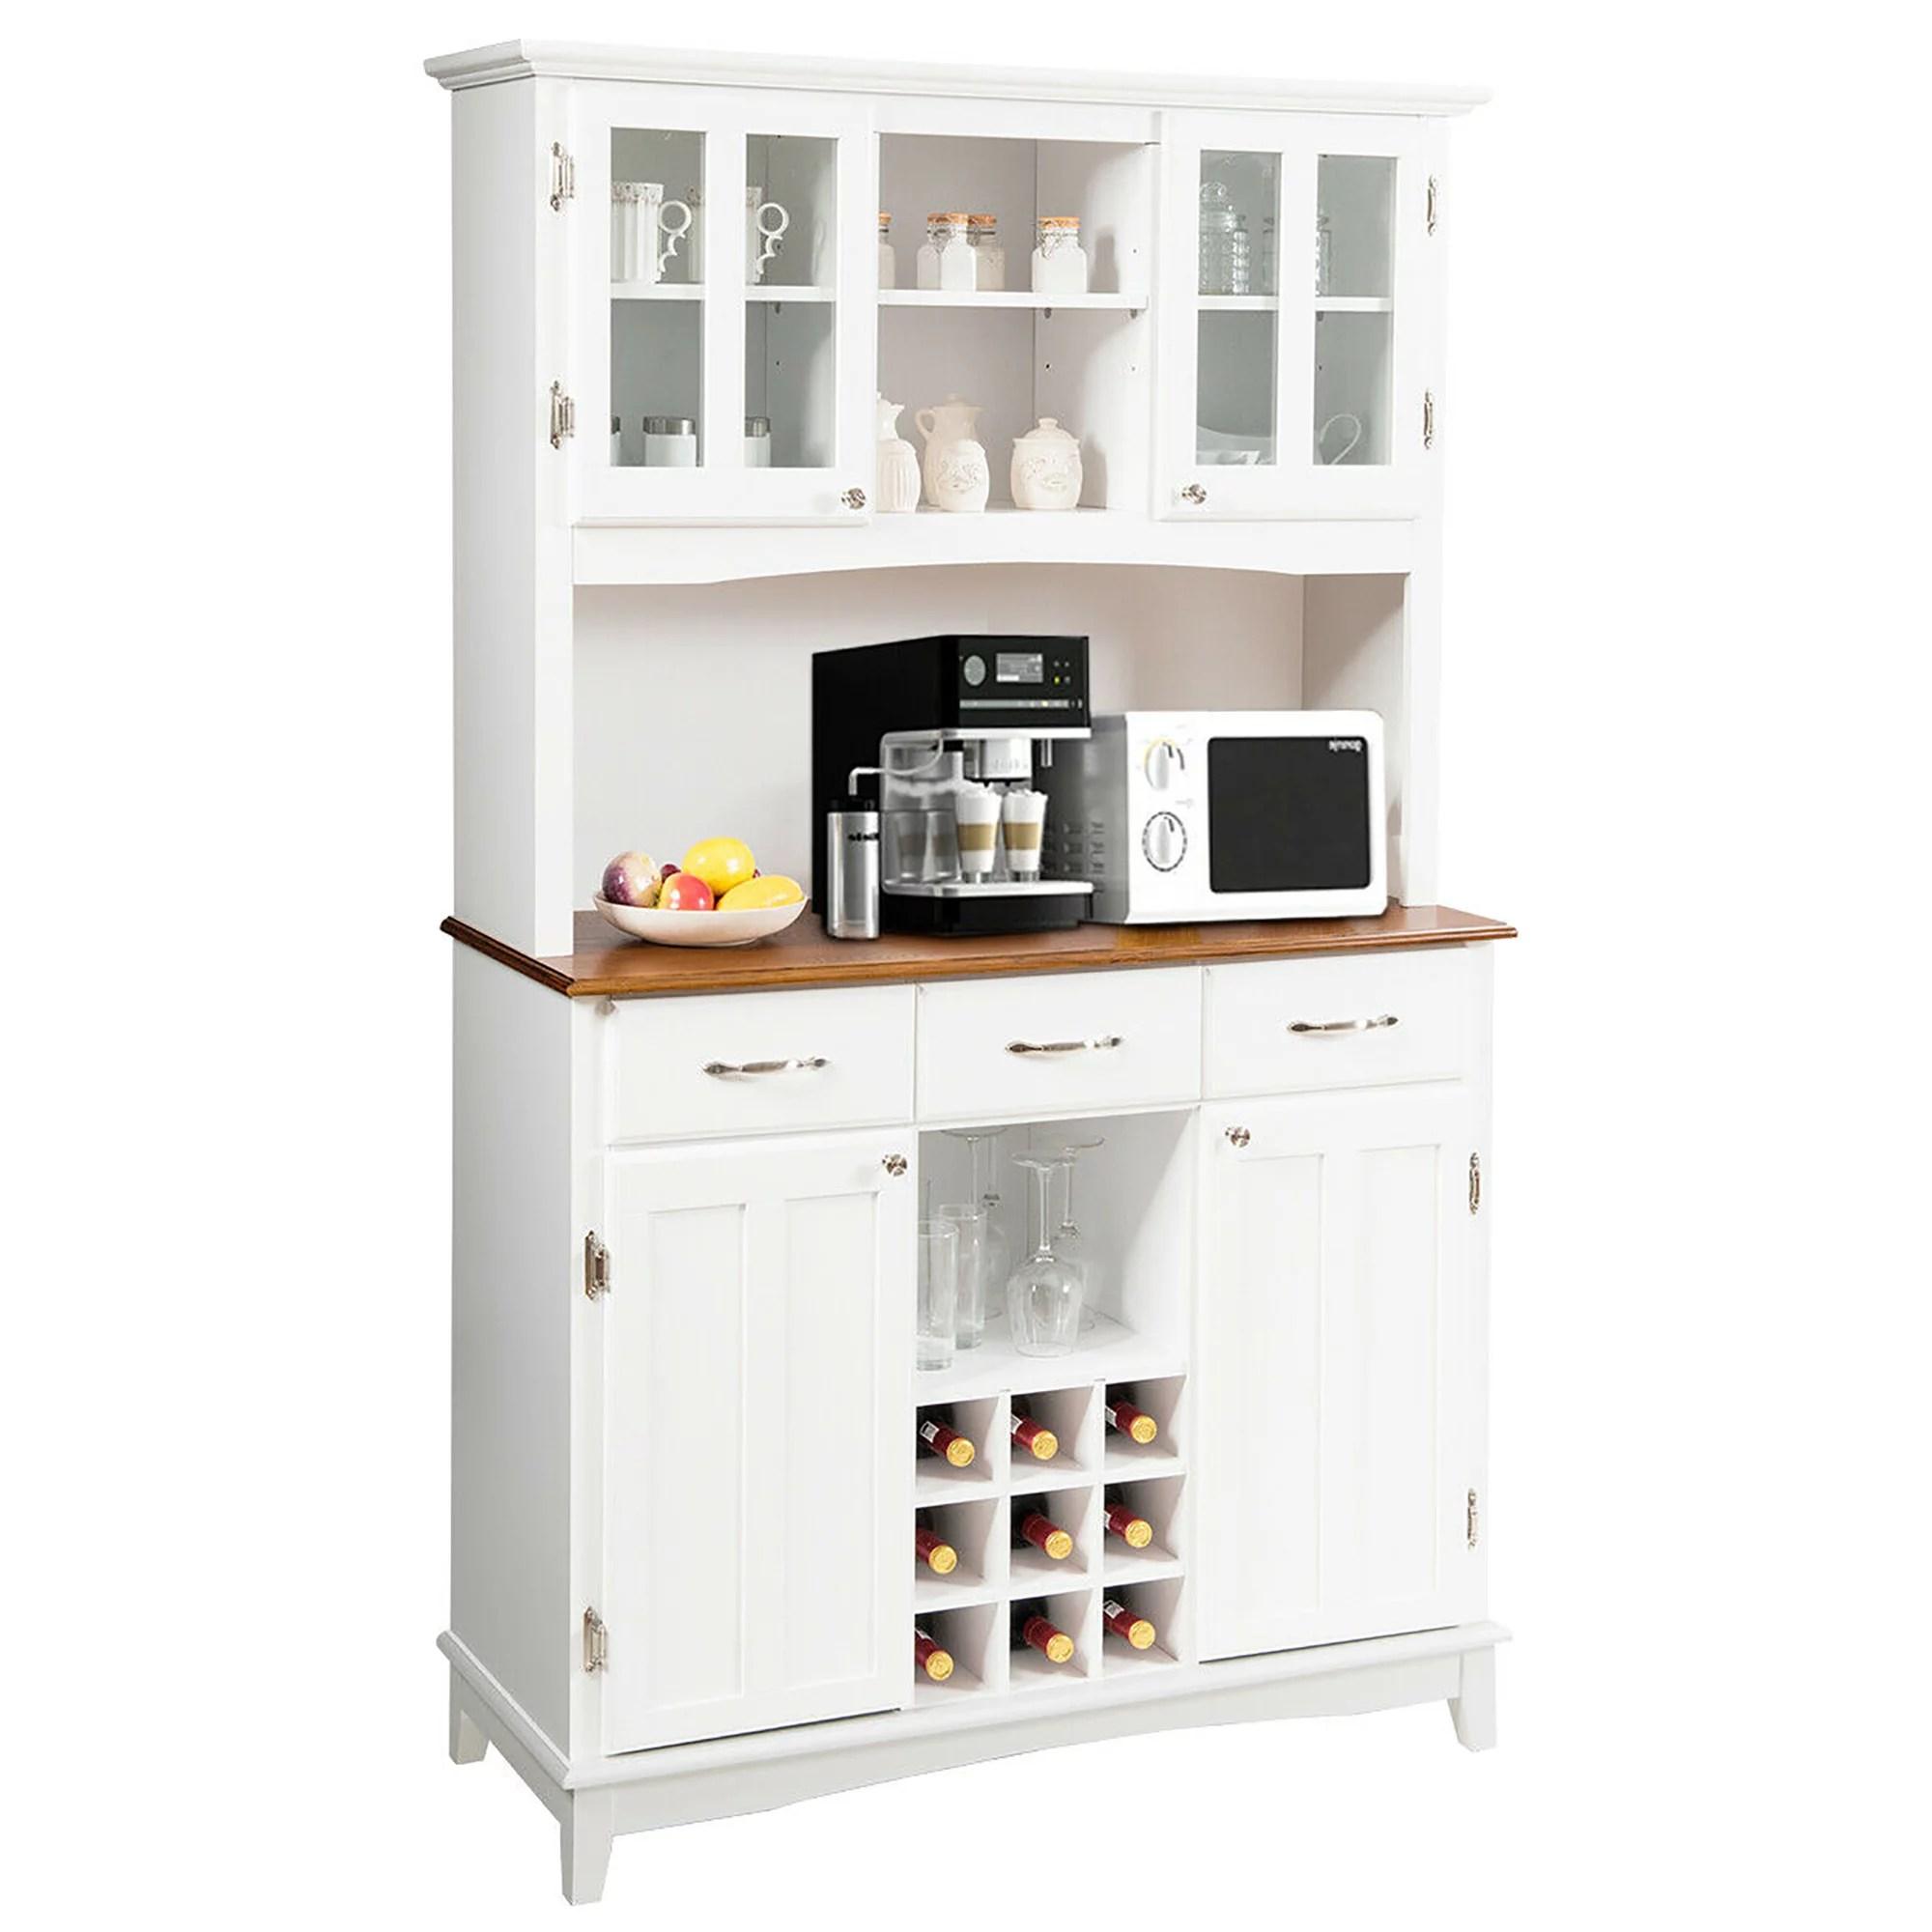 costway buffet and hutch kitchen storage cabinet cupboard w wine rack drawers white walmart com